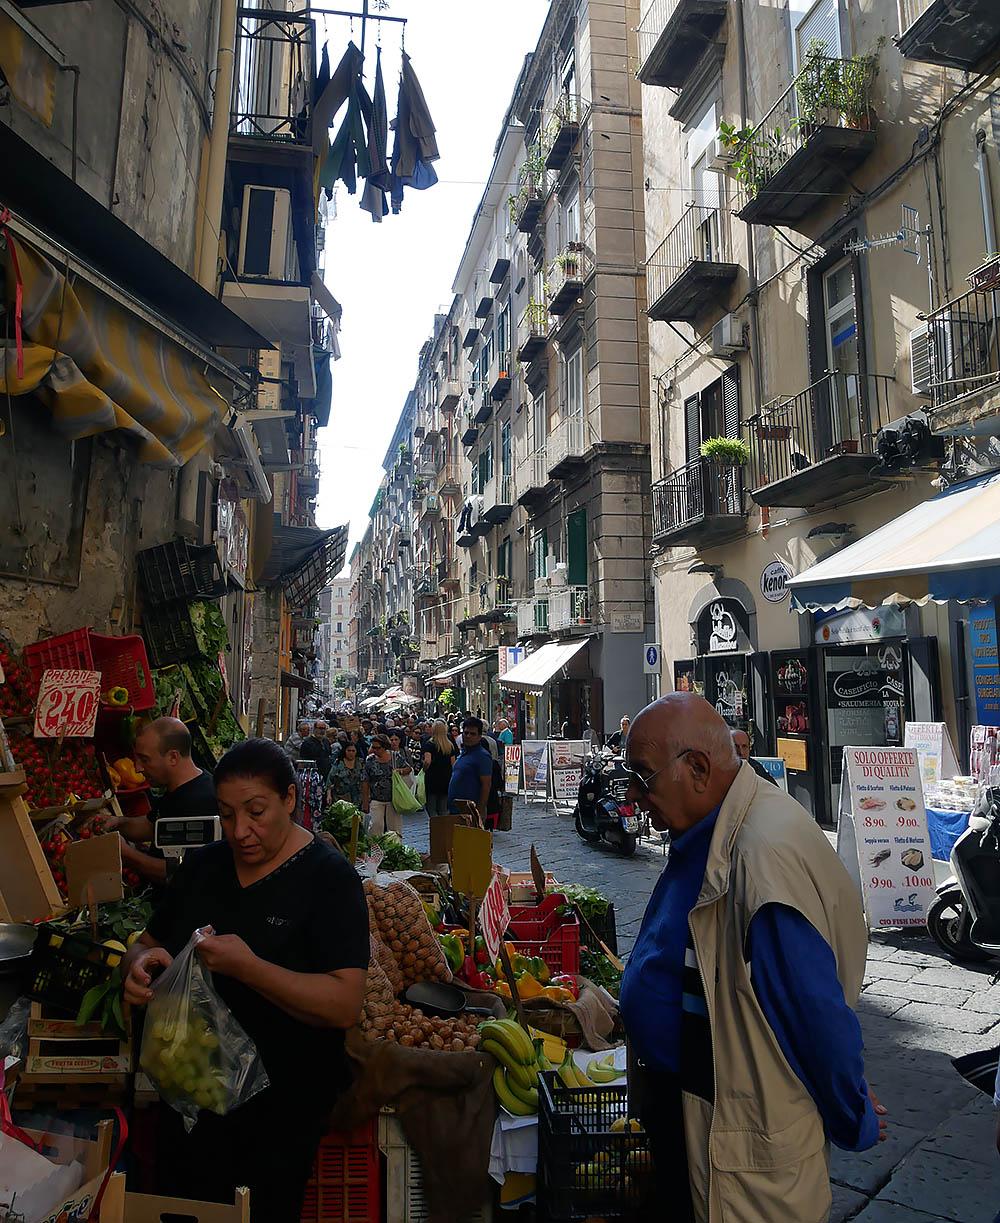 market_neapel.jpg